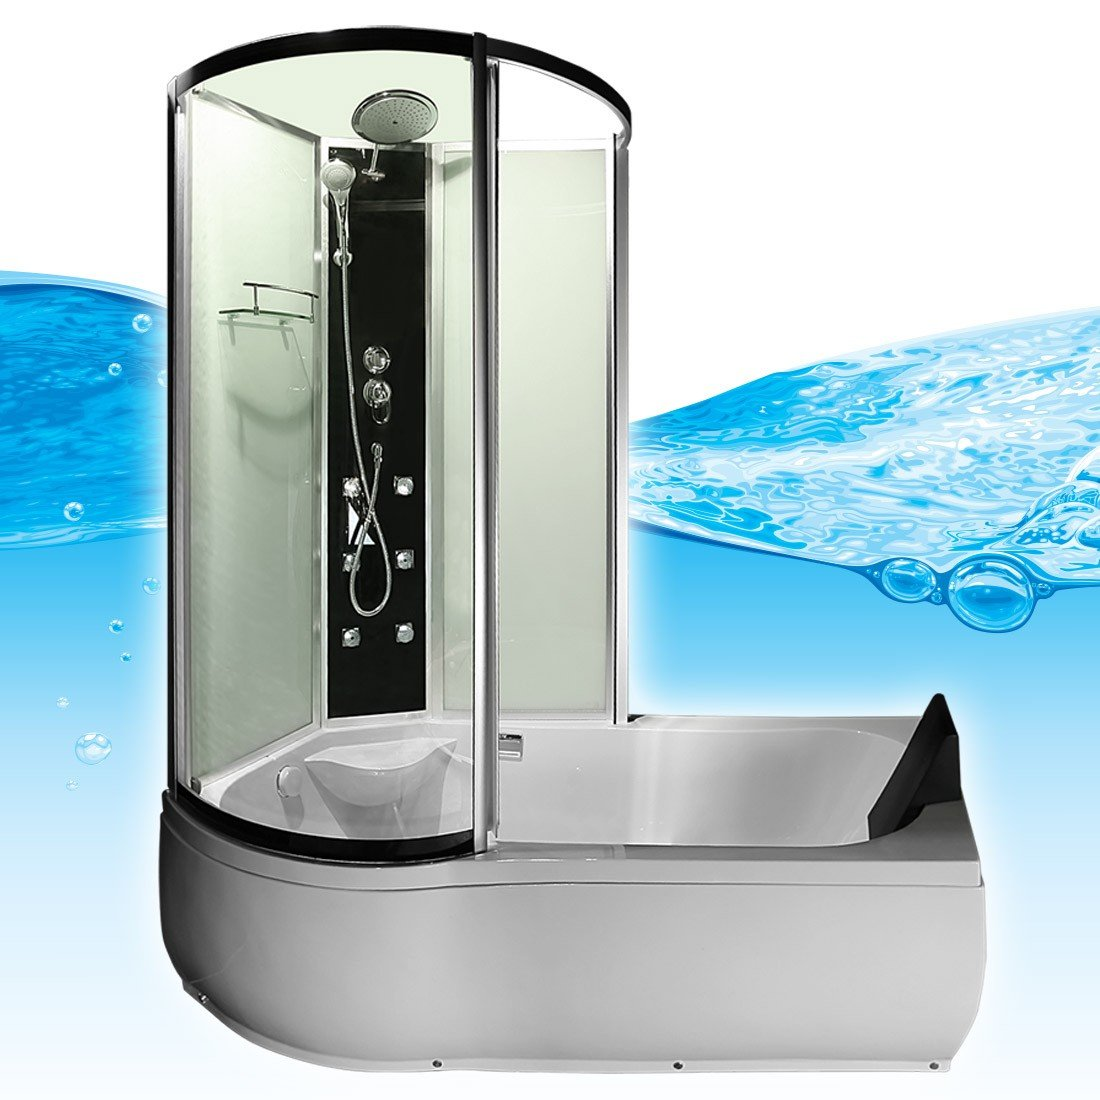 AcquaVapore DTP8050-A000R Wanne, Badewanne, Dusche, Duschkabine ... | {Badewanne mit dusche 40}